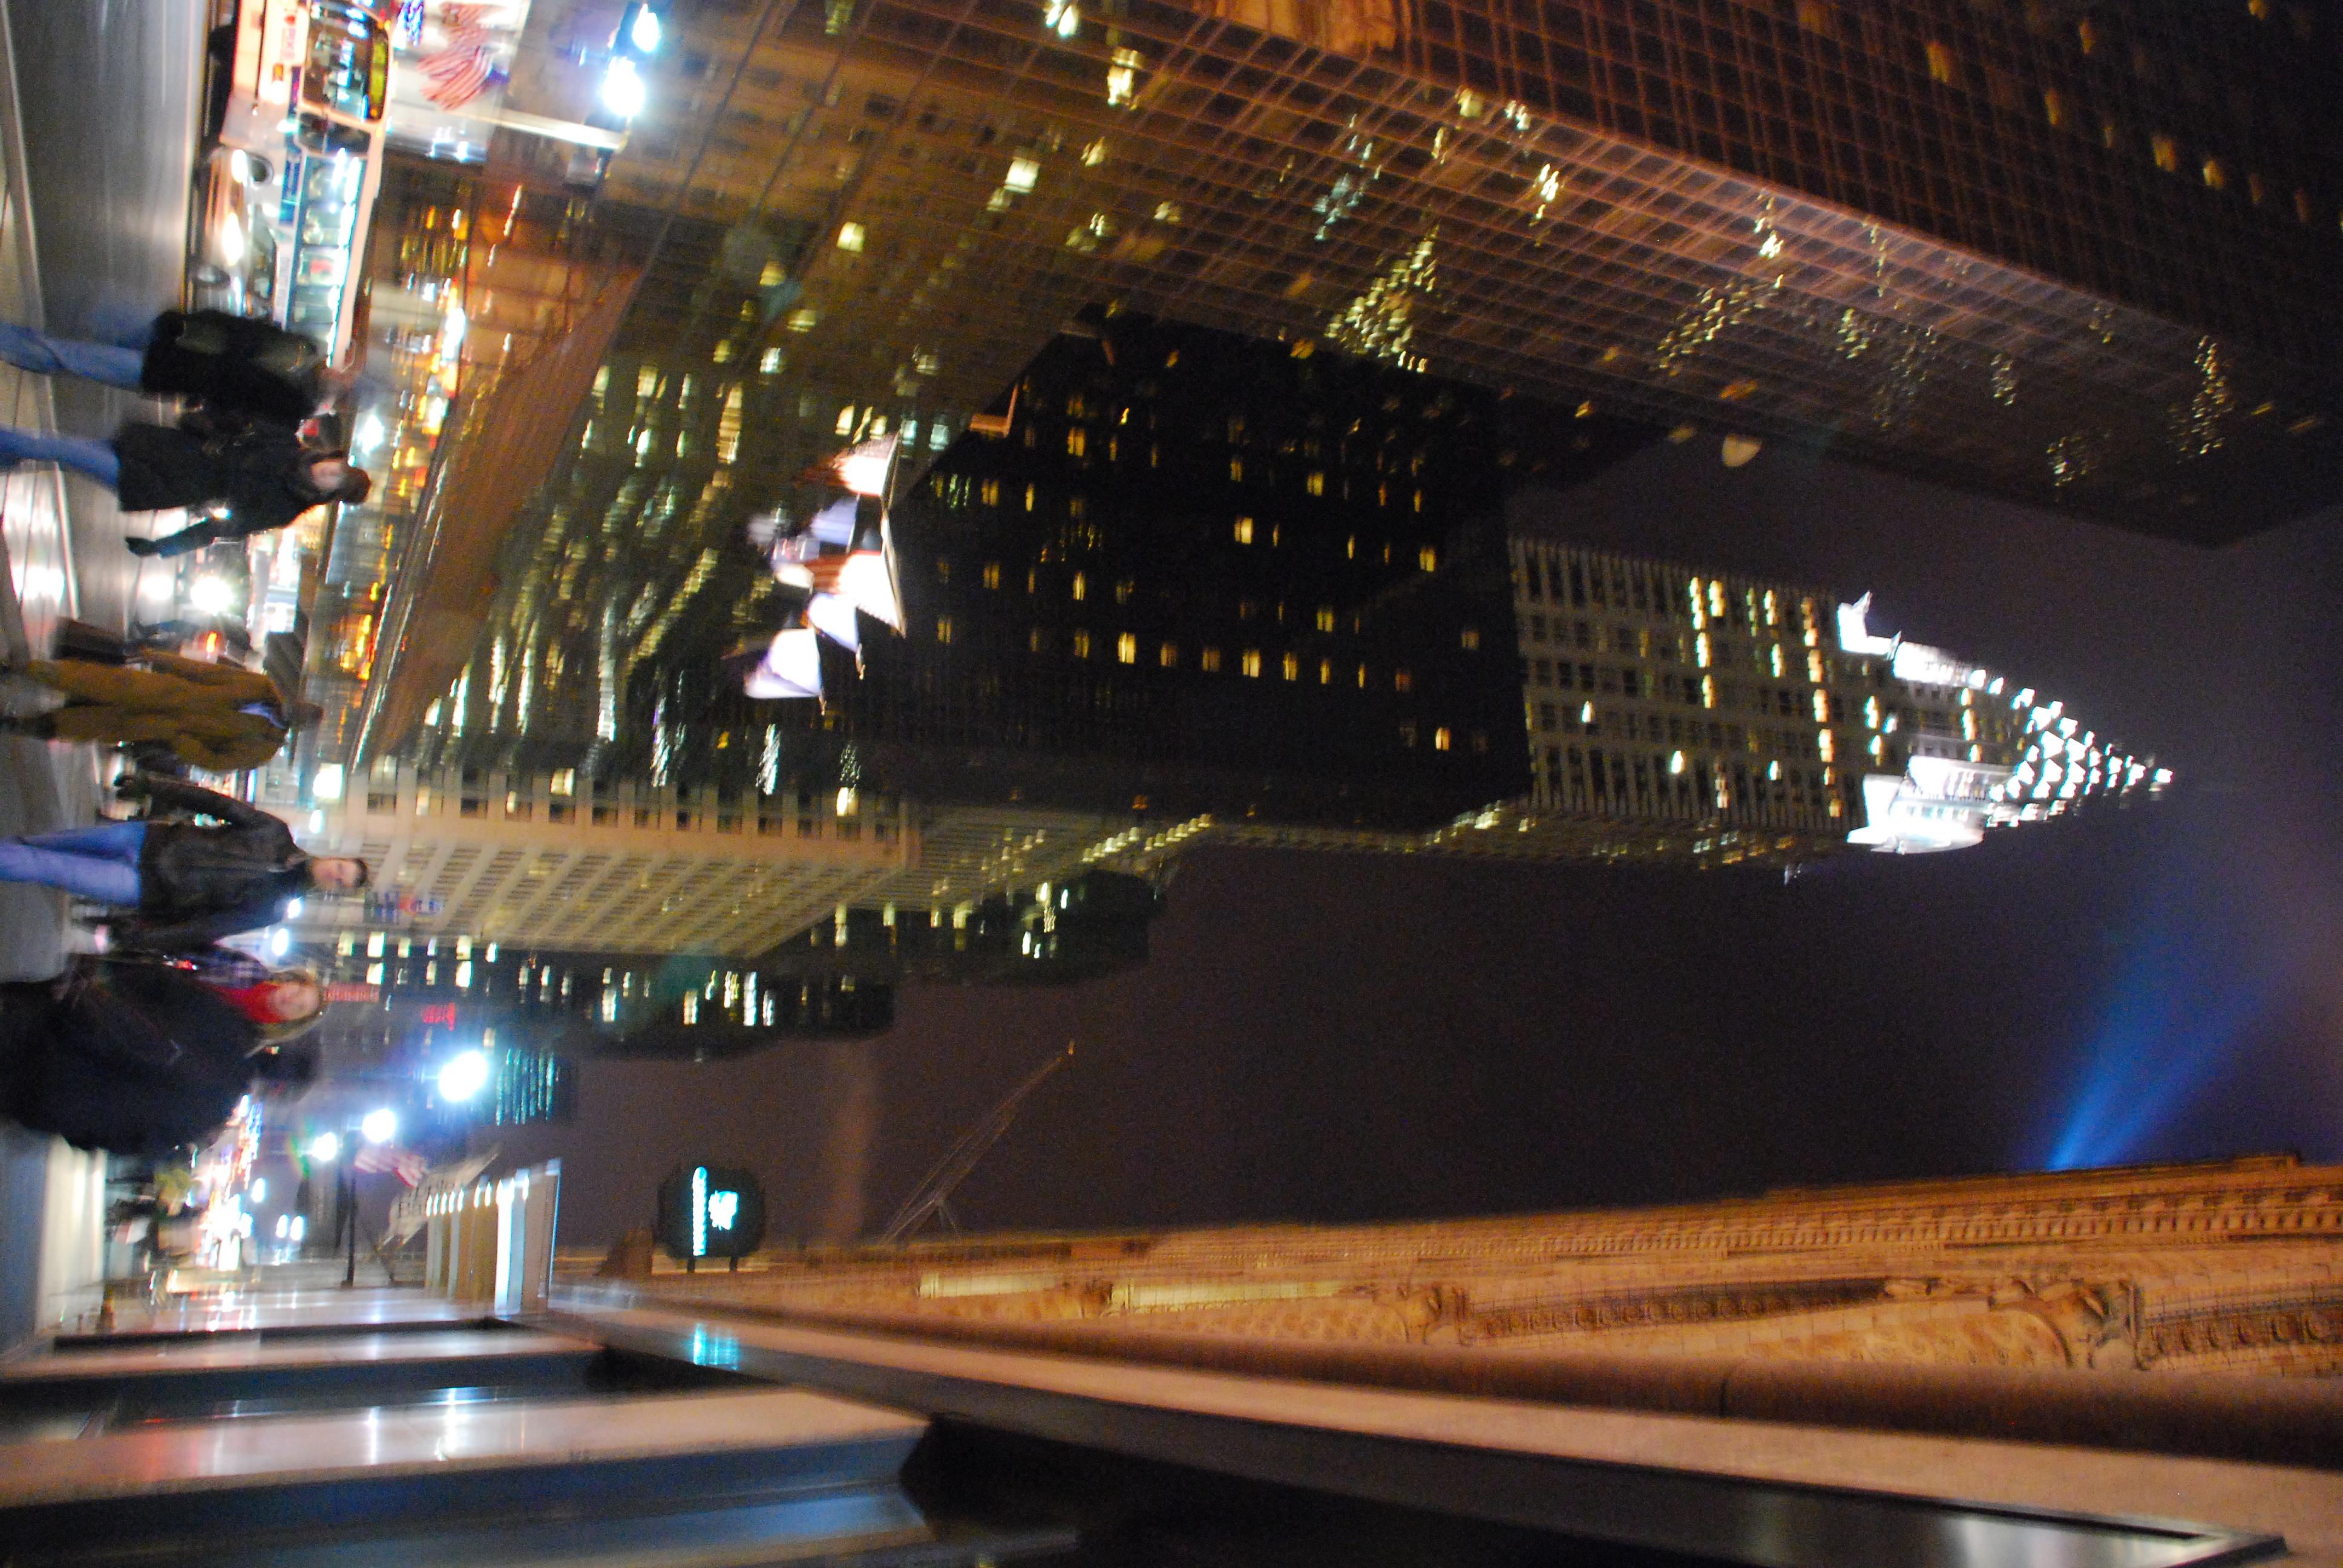 Chrysler Building Wikipedia: File:Chrysler Building, Downtown Manhattan.JPG